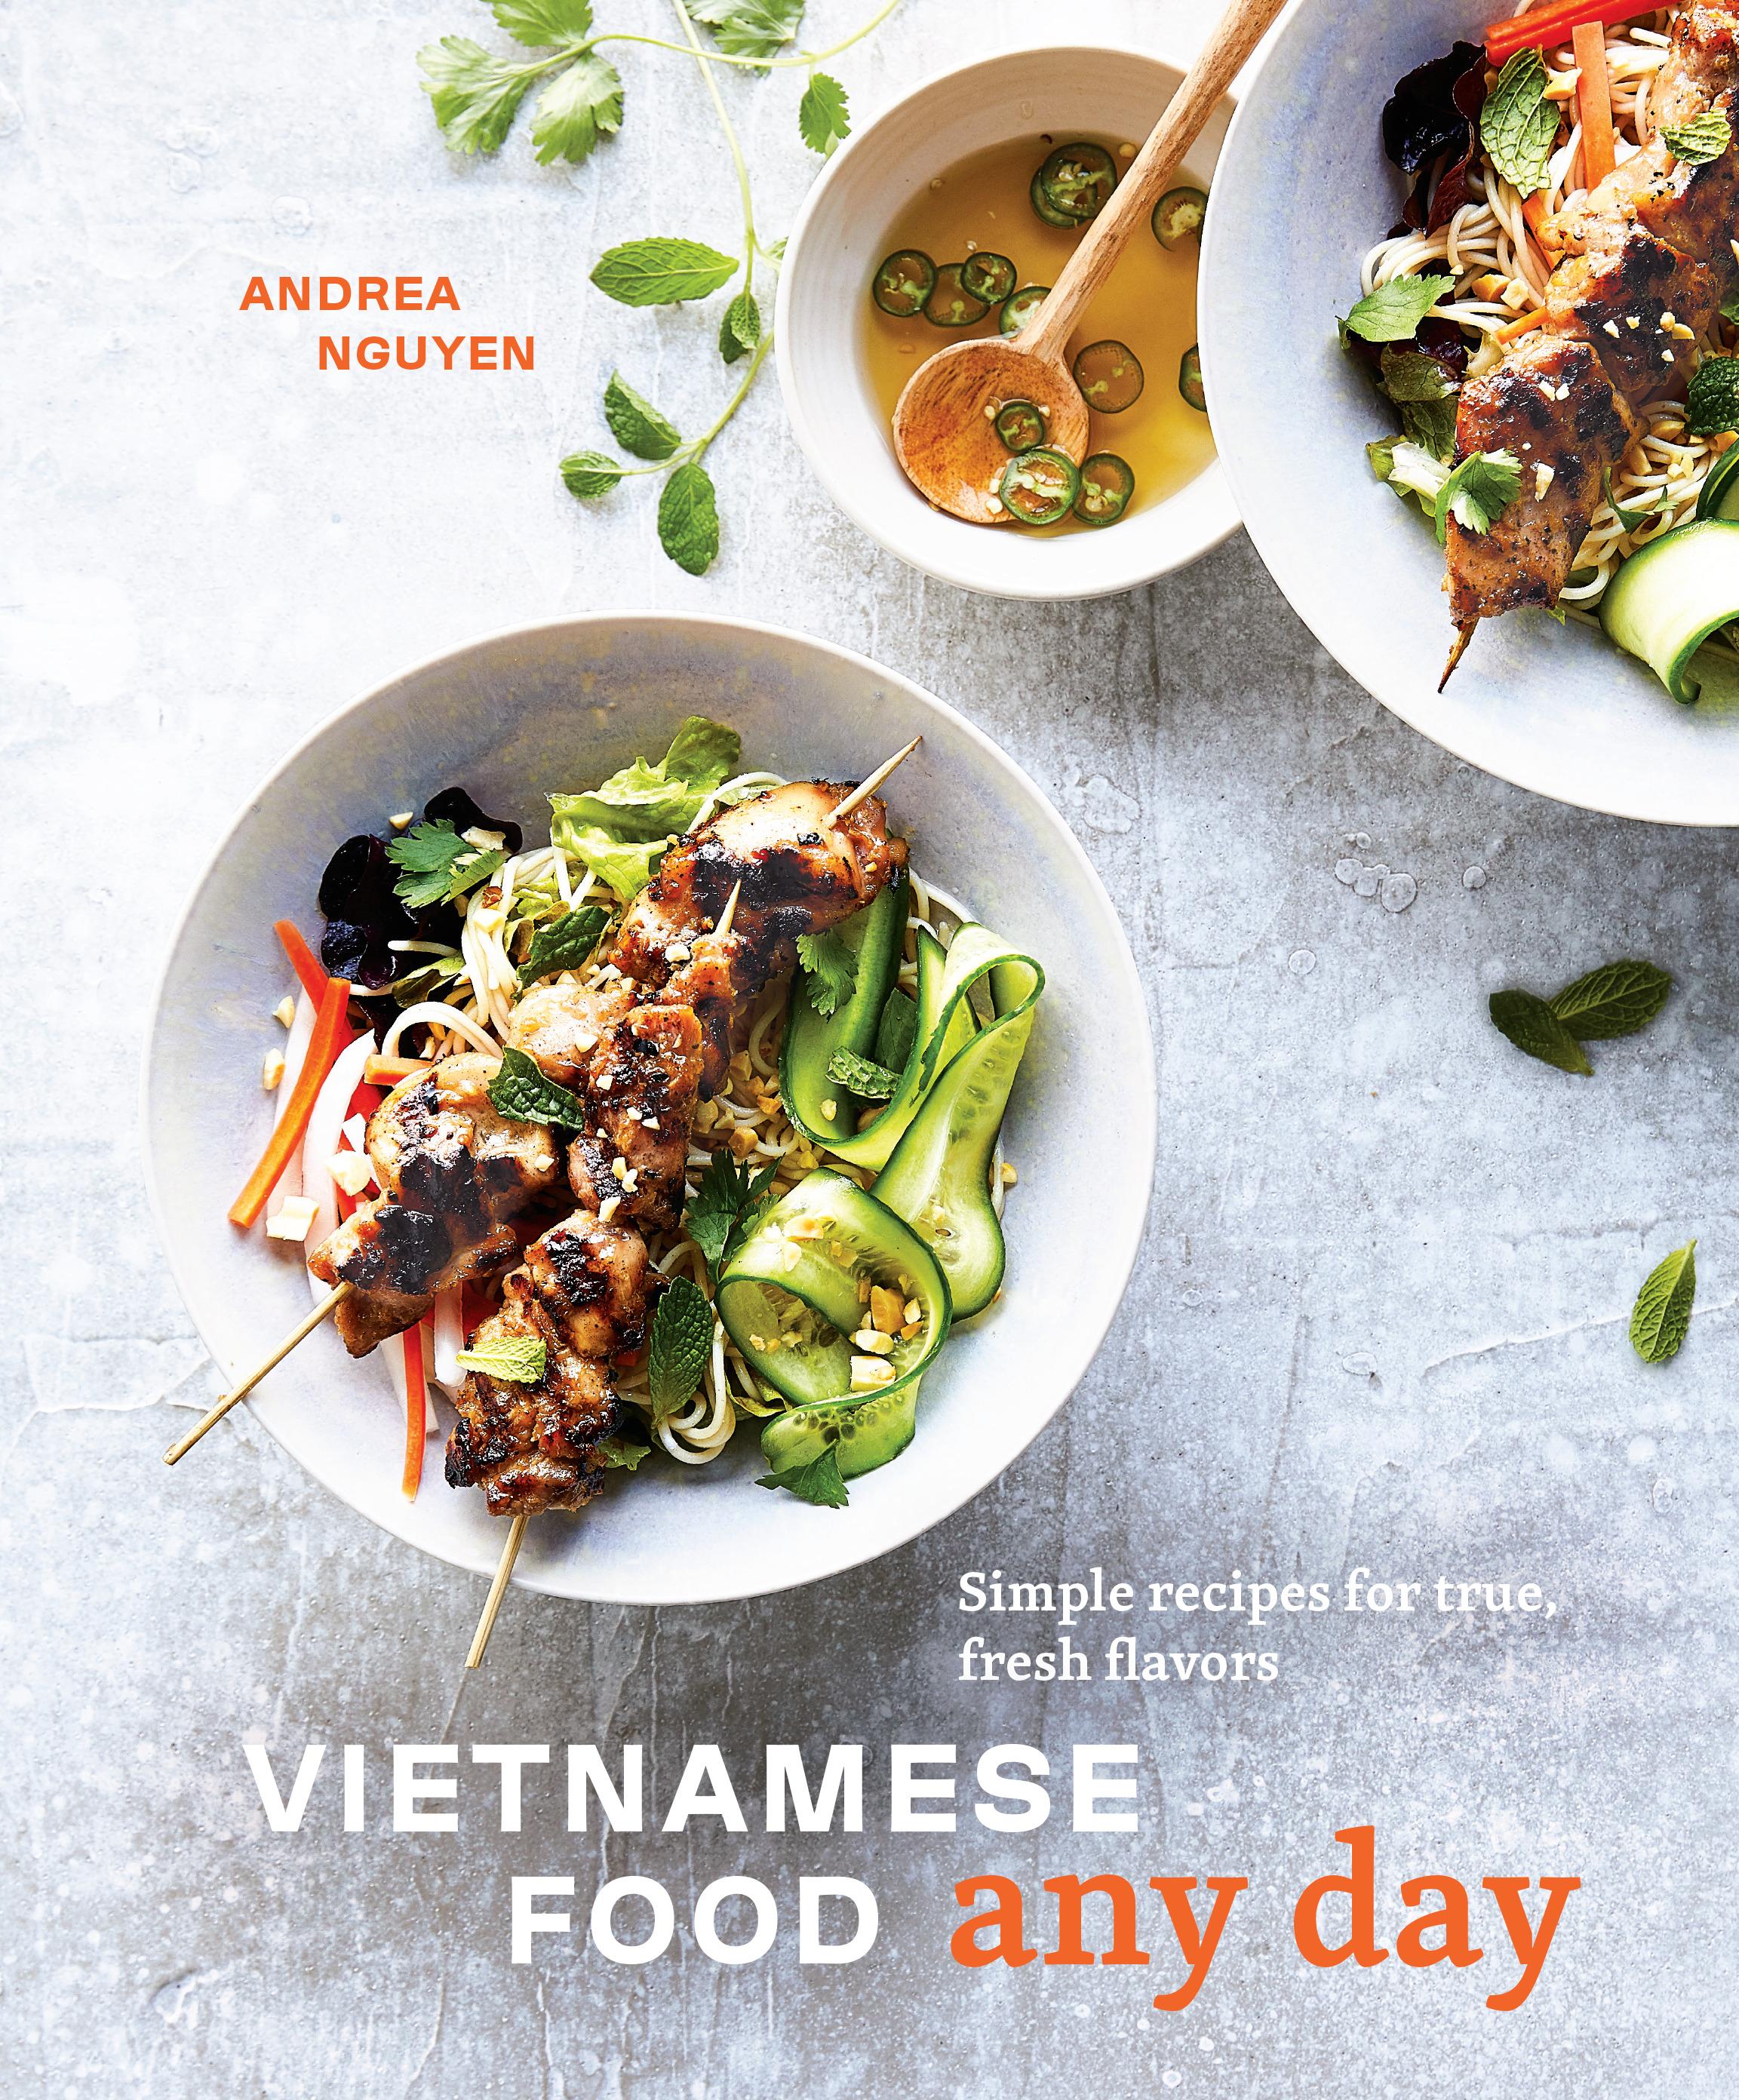 vietnamese-food-any-day-from-ten-speed-press.jpg